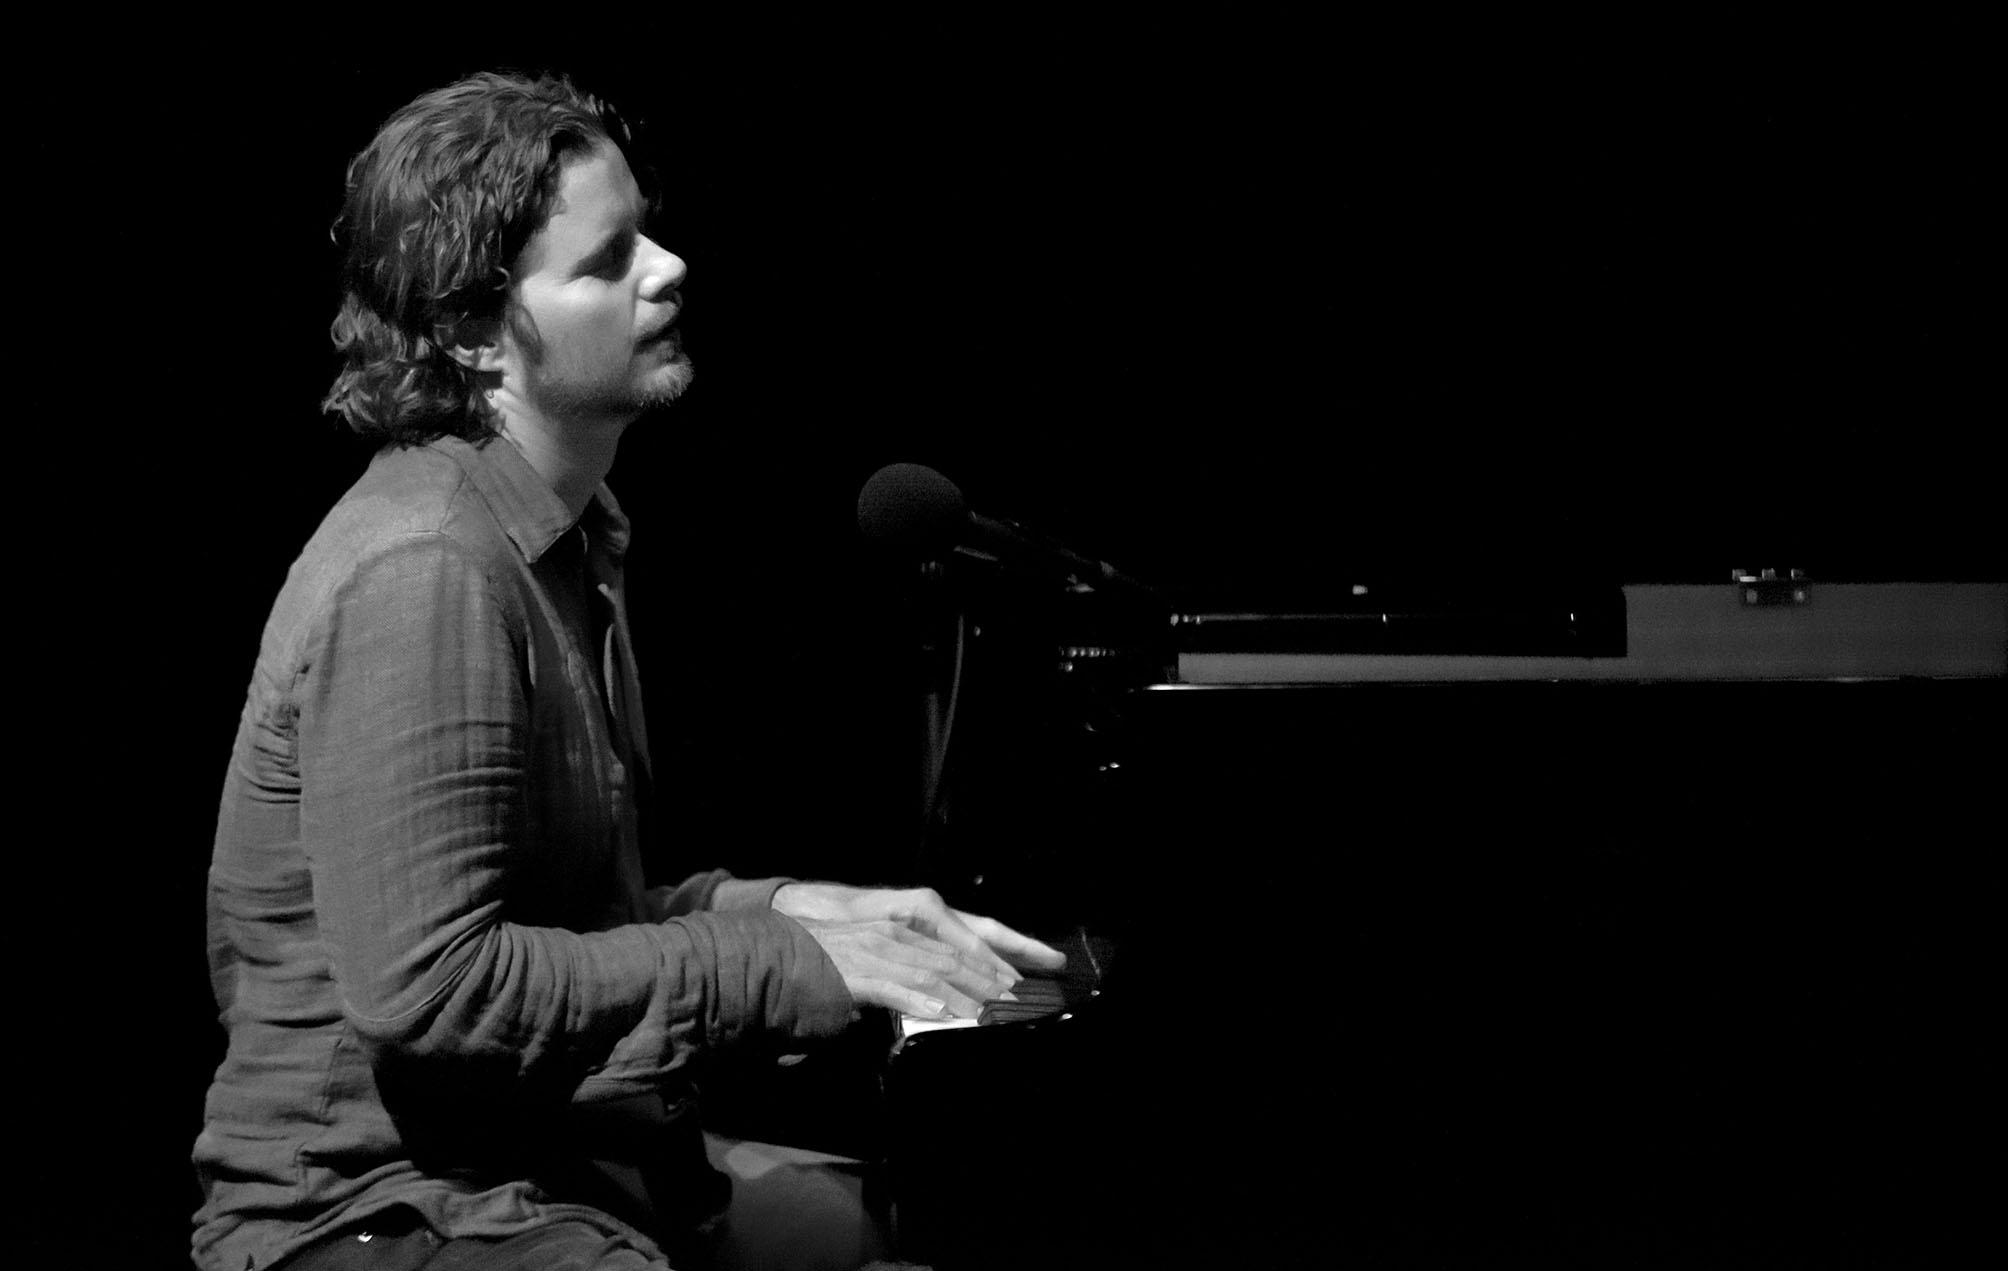 Reijseger/Fraanje/Sylla at Dutch Jazz & World Meeting 2012